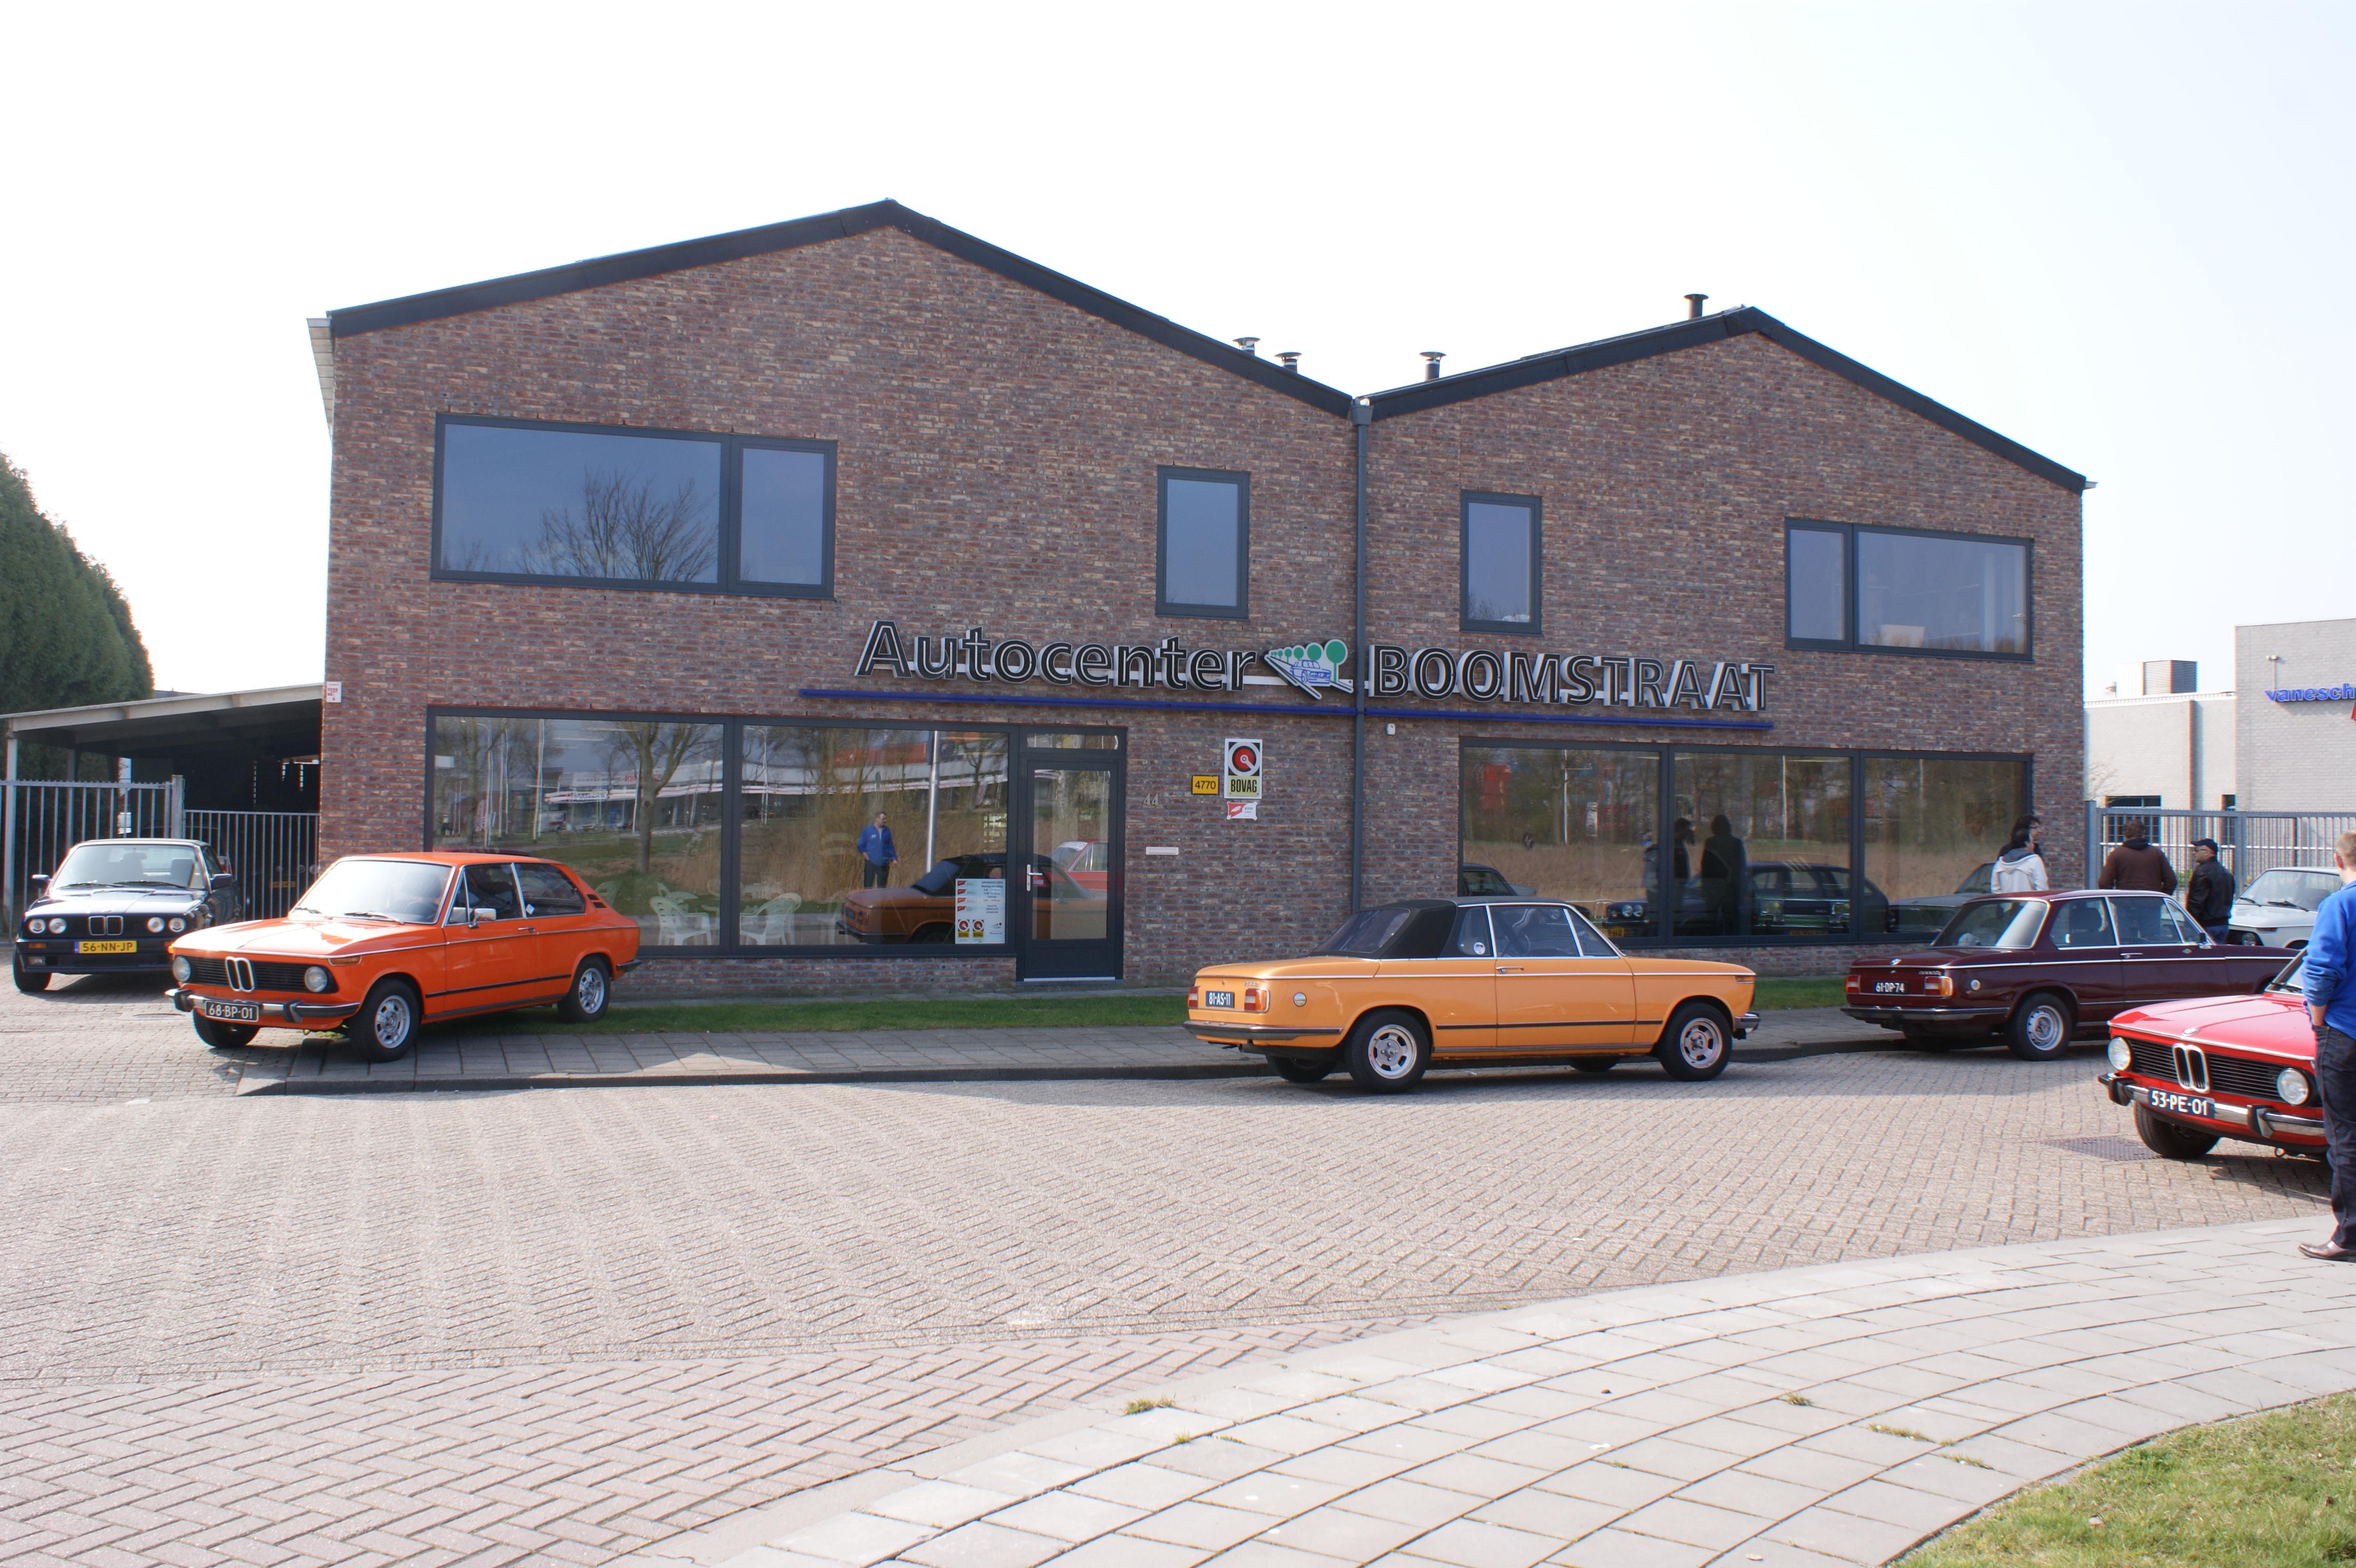 Autocenter Boomstraat